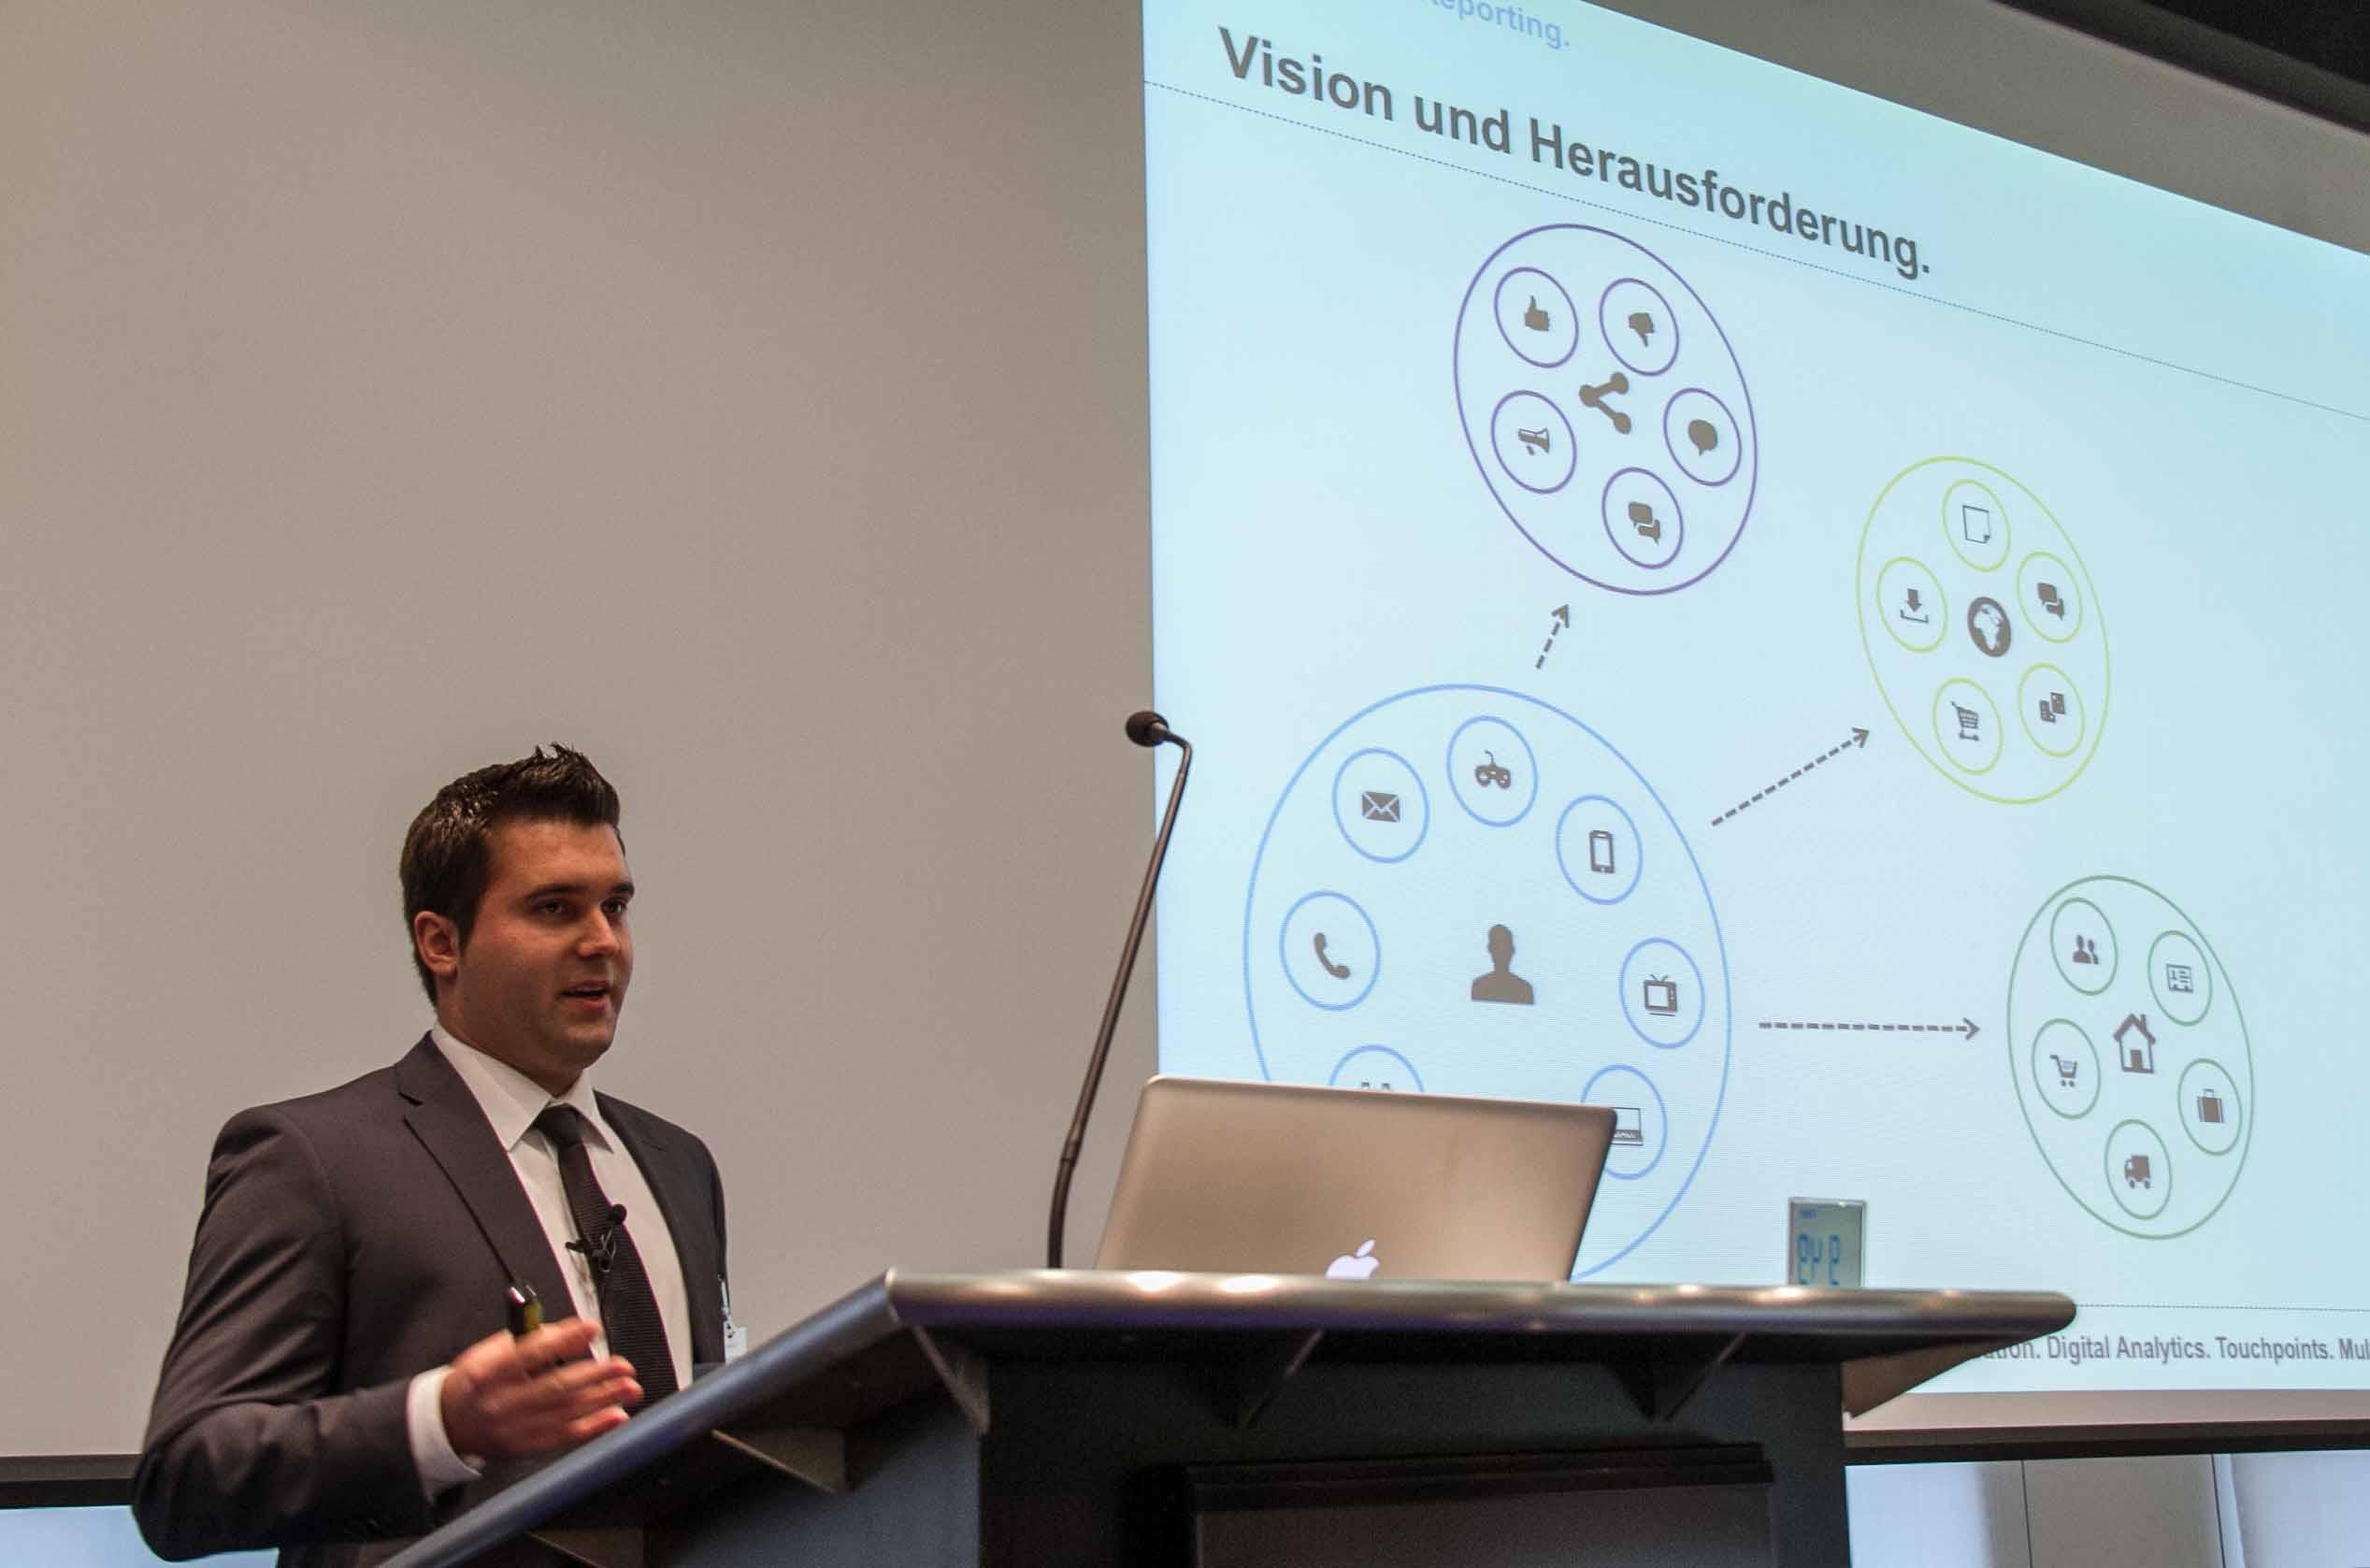 Emanuel-Baechtiger-Namics-Vision-360-Grad-Analytics-Reporting